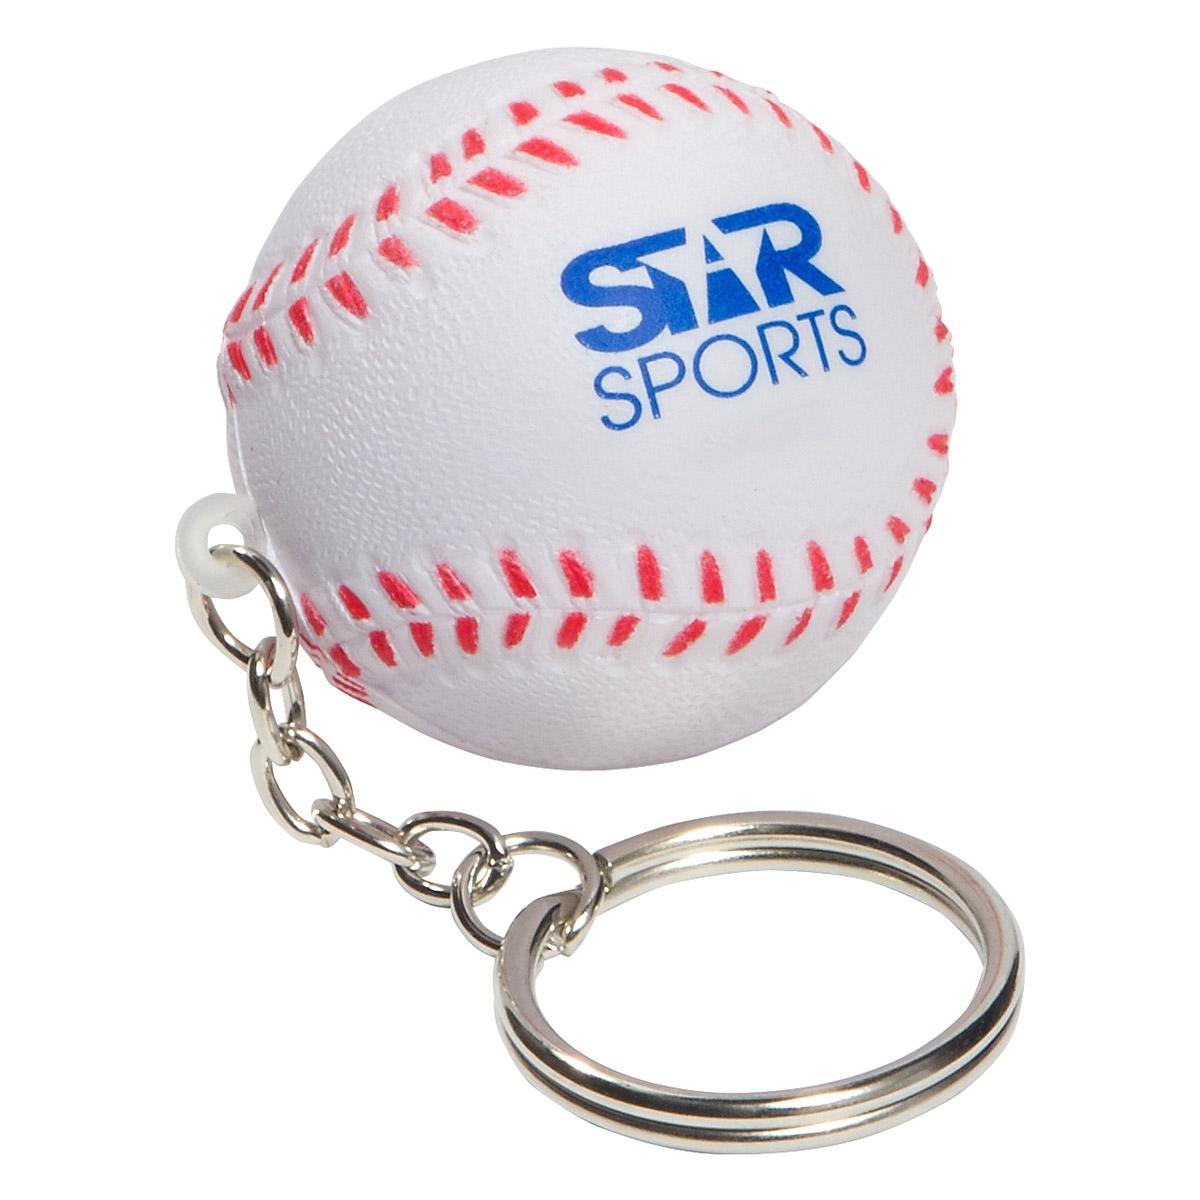 Baseball Stress Reliever Key Chain, LKC-BA01, 1 Colour Imprint